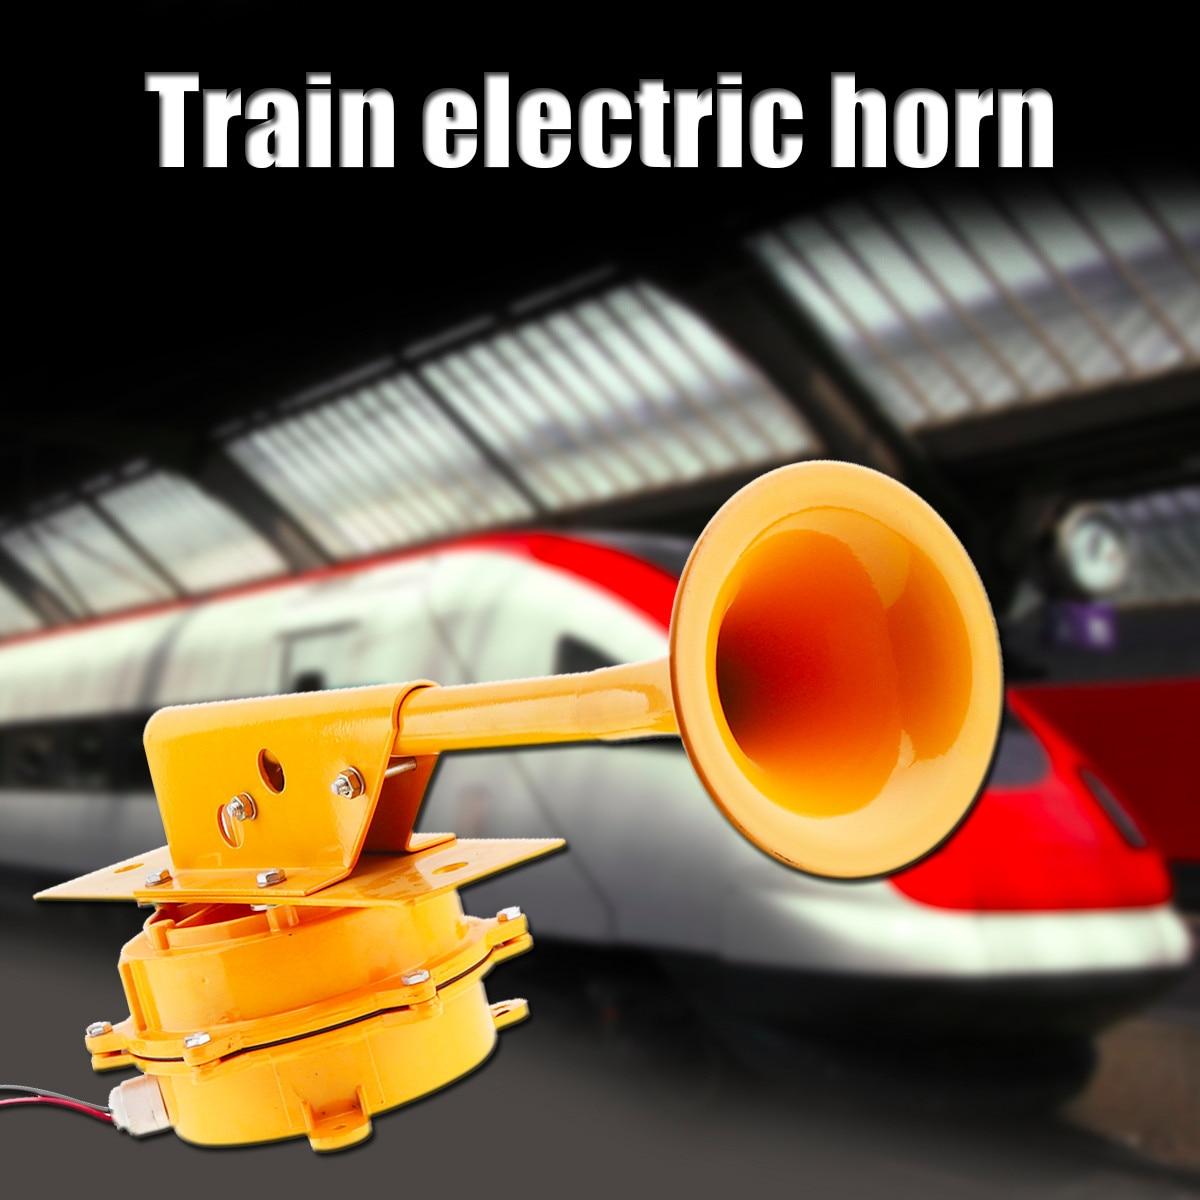 12V / 24V 126DB Super Loud Train Horn All Metal Car Air Horn No Need Compressor for Auto Truck Boat Train Lorry